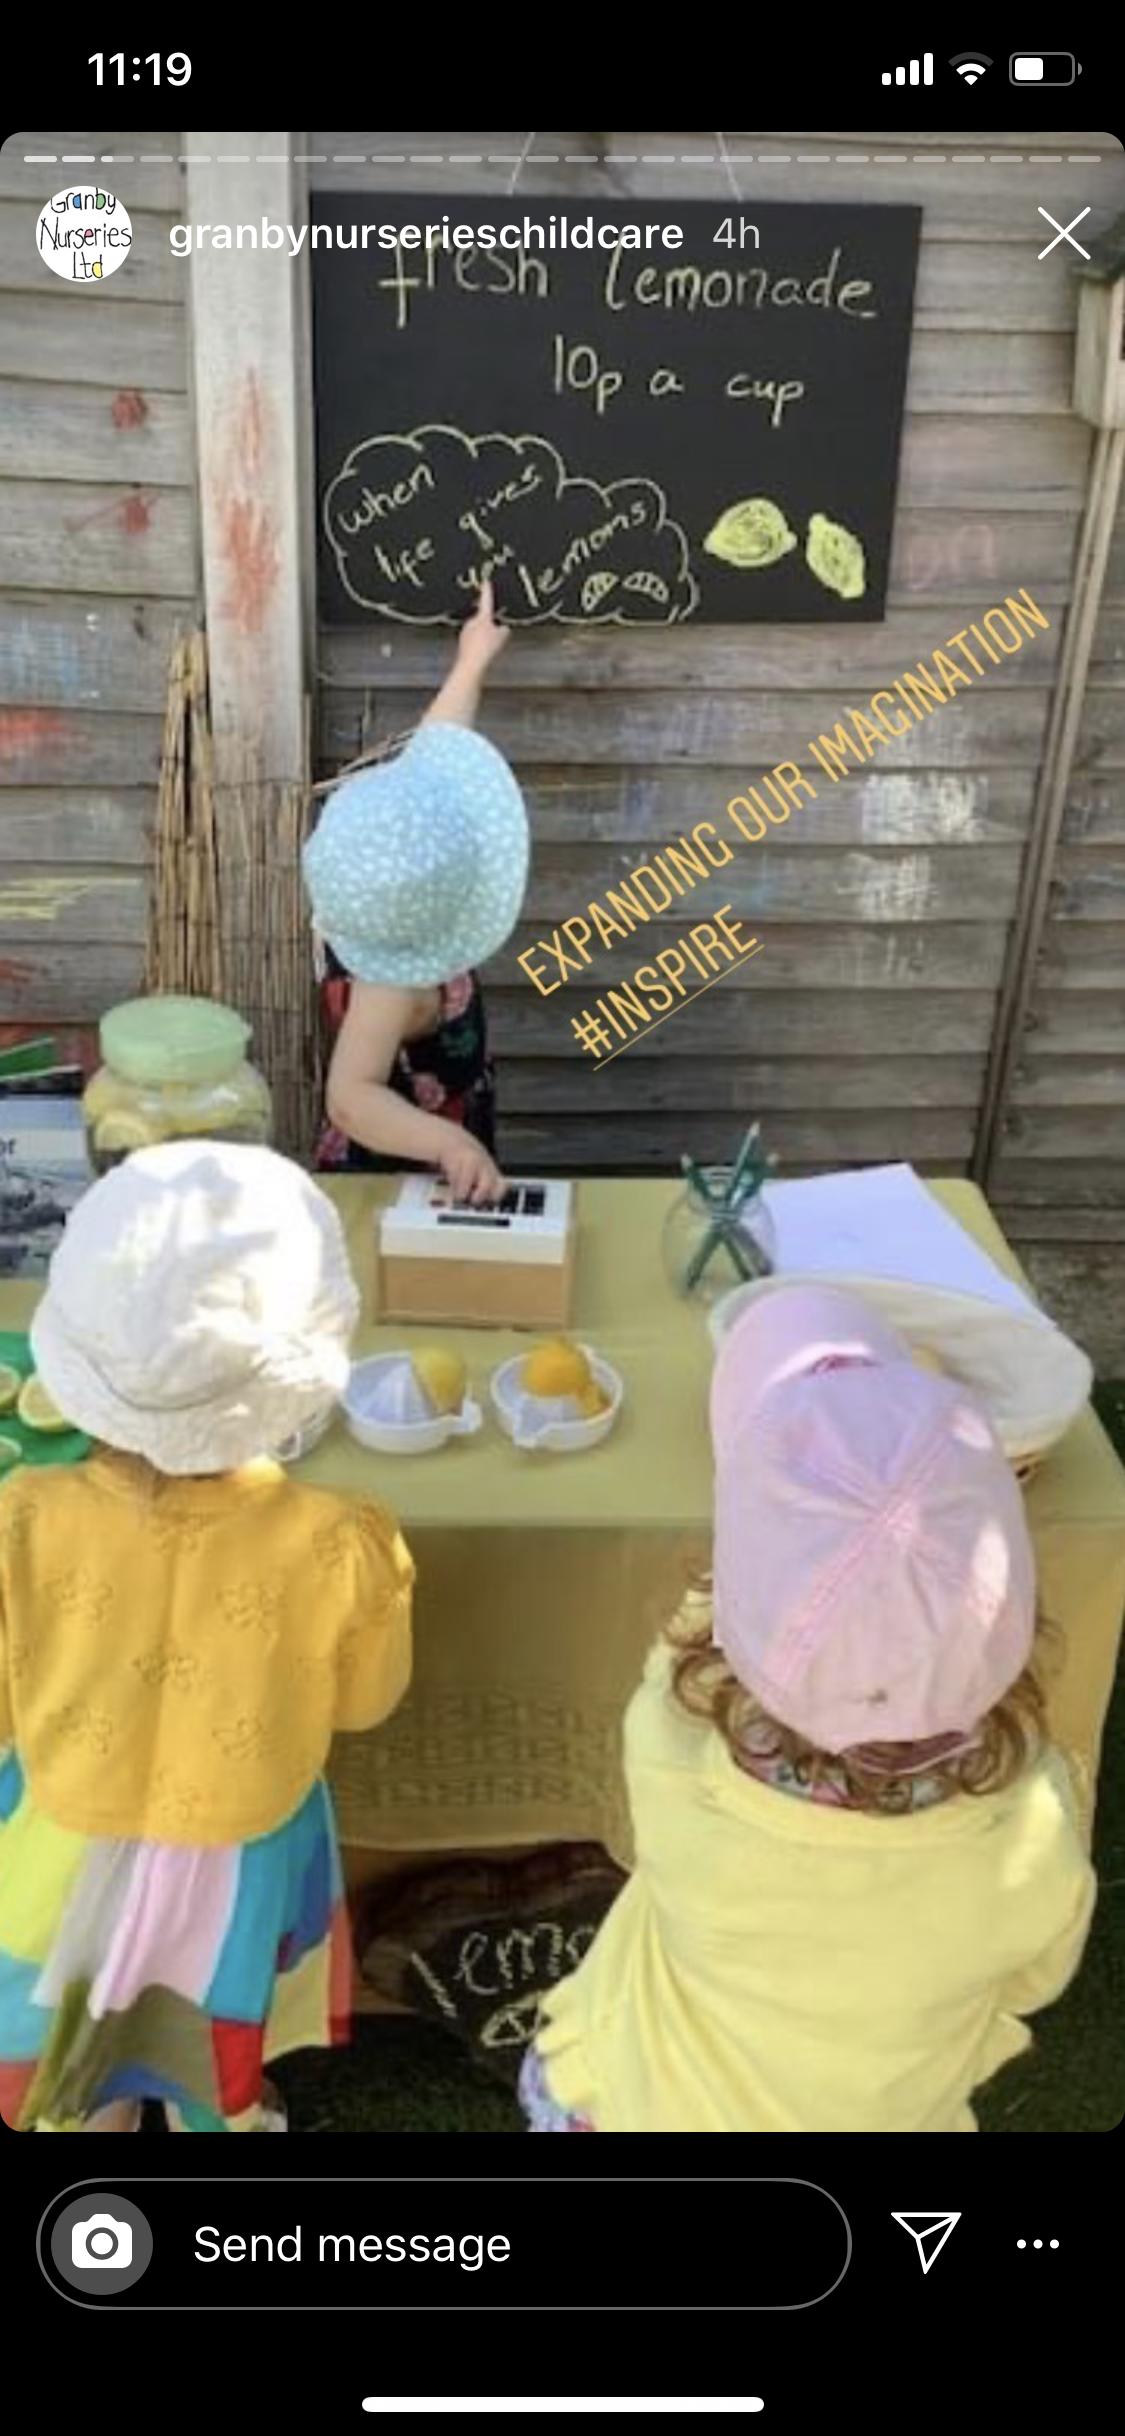 Photo of Granby Nurseries Childcare inspiration